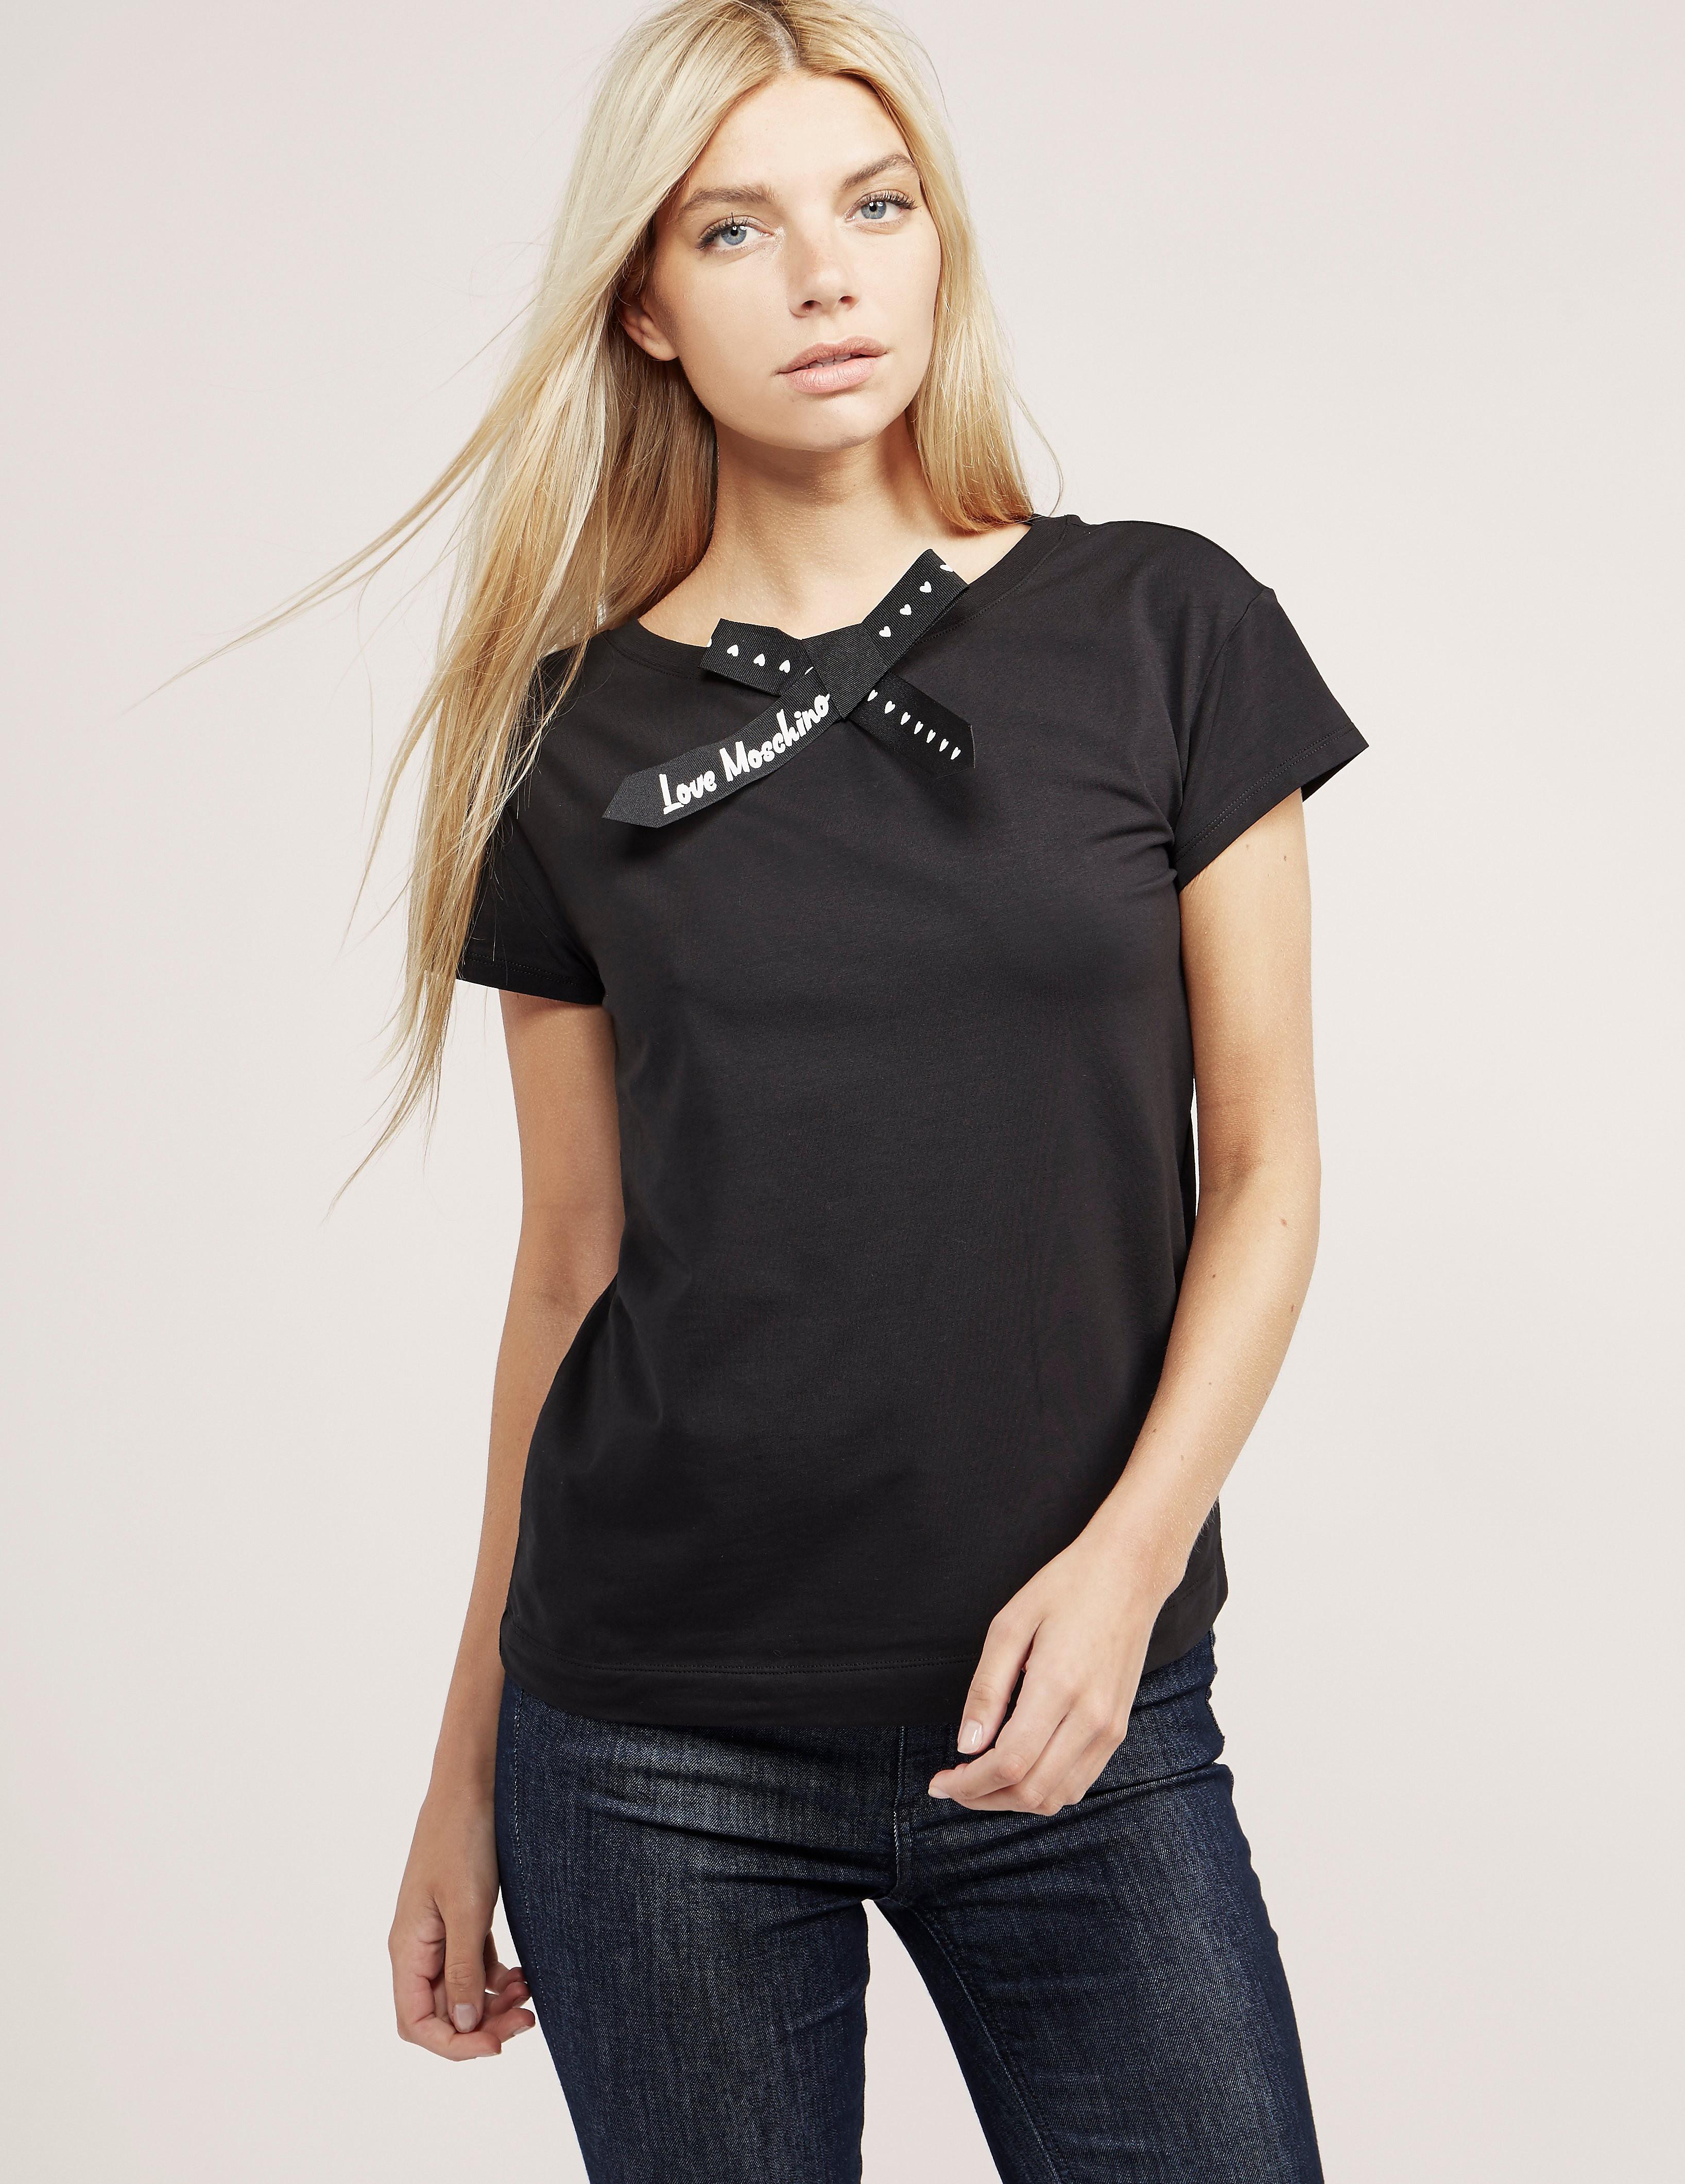 Love Moschino Bow Short Sleeve T-Shirt